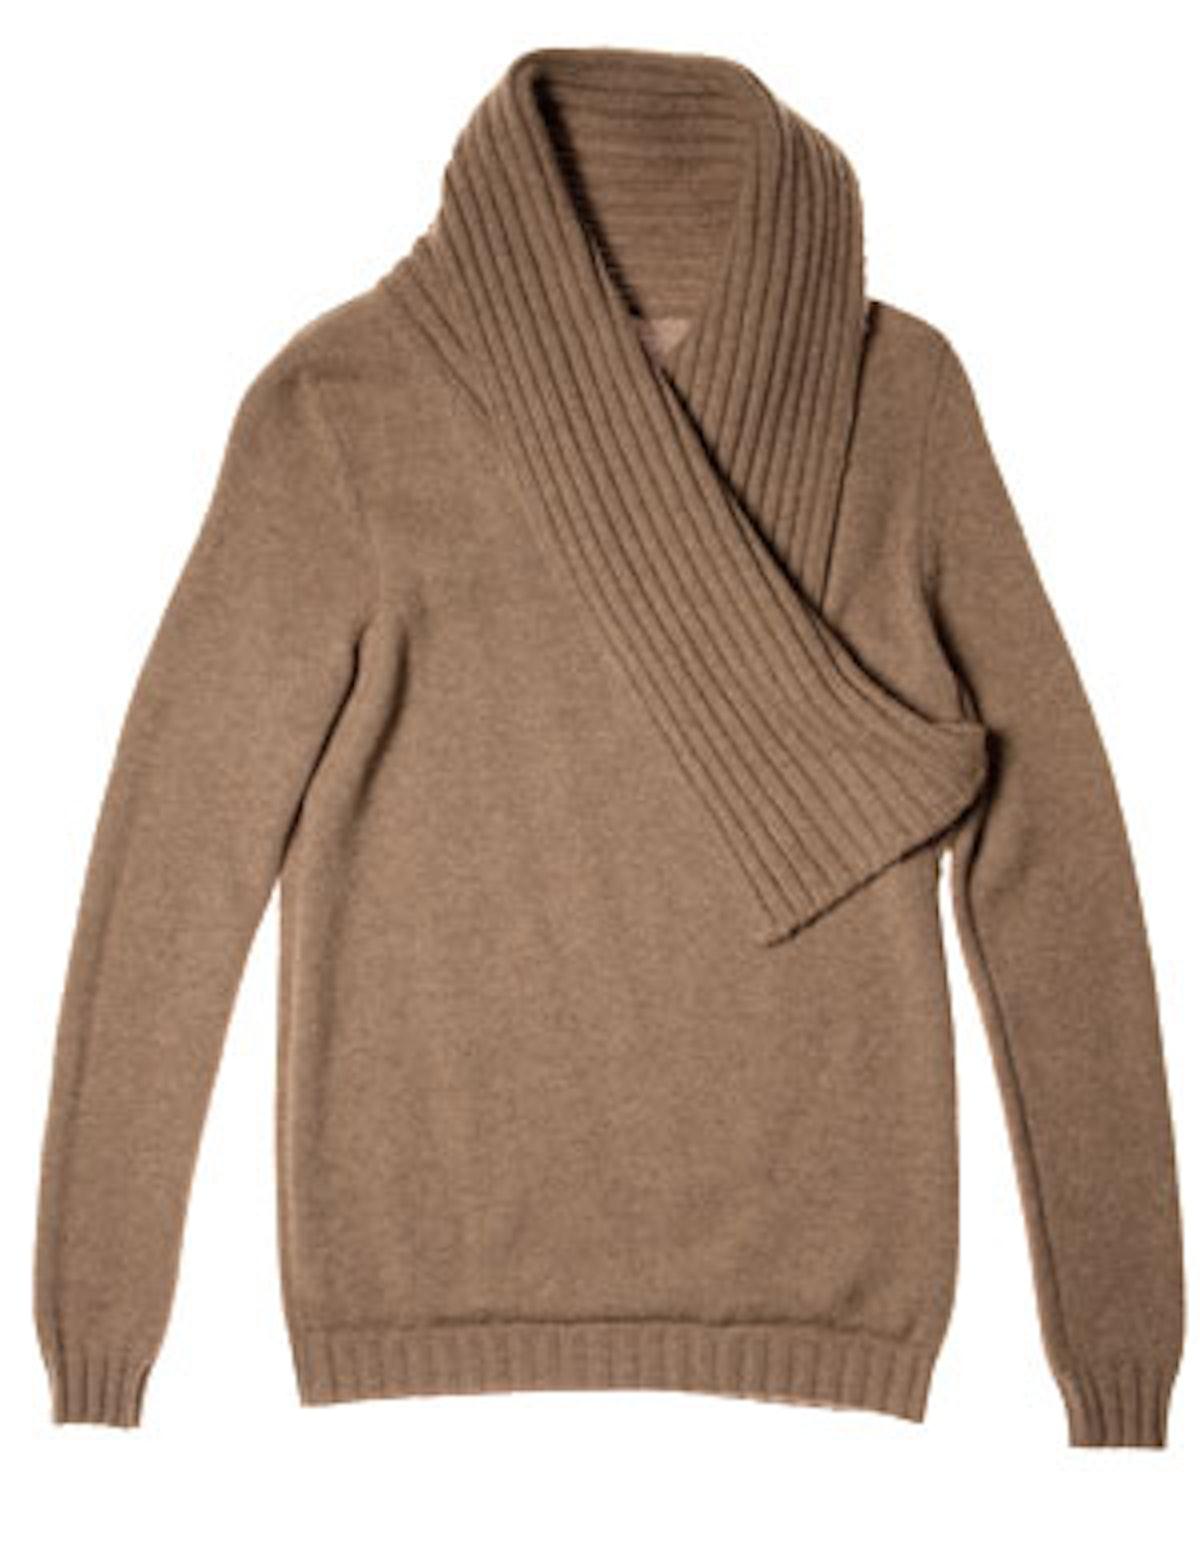 fass_sweater_01_v.jpg